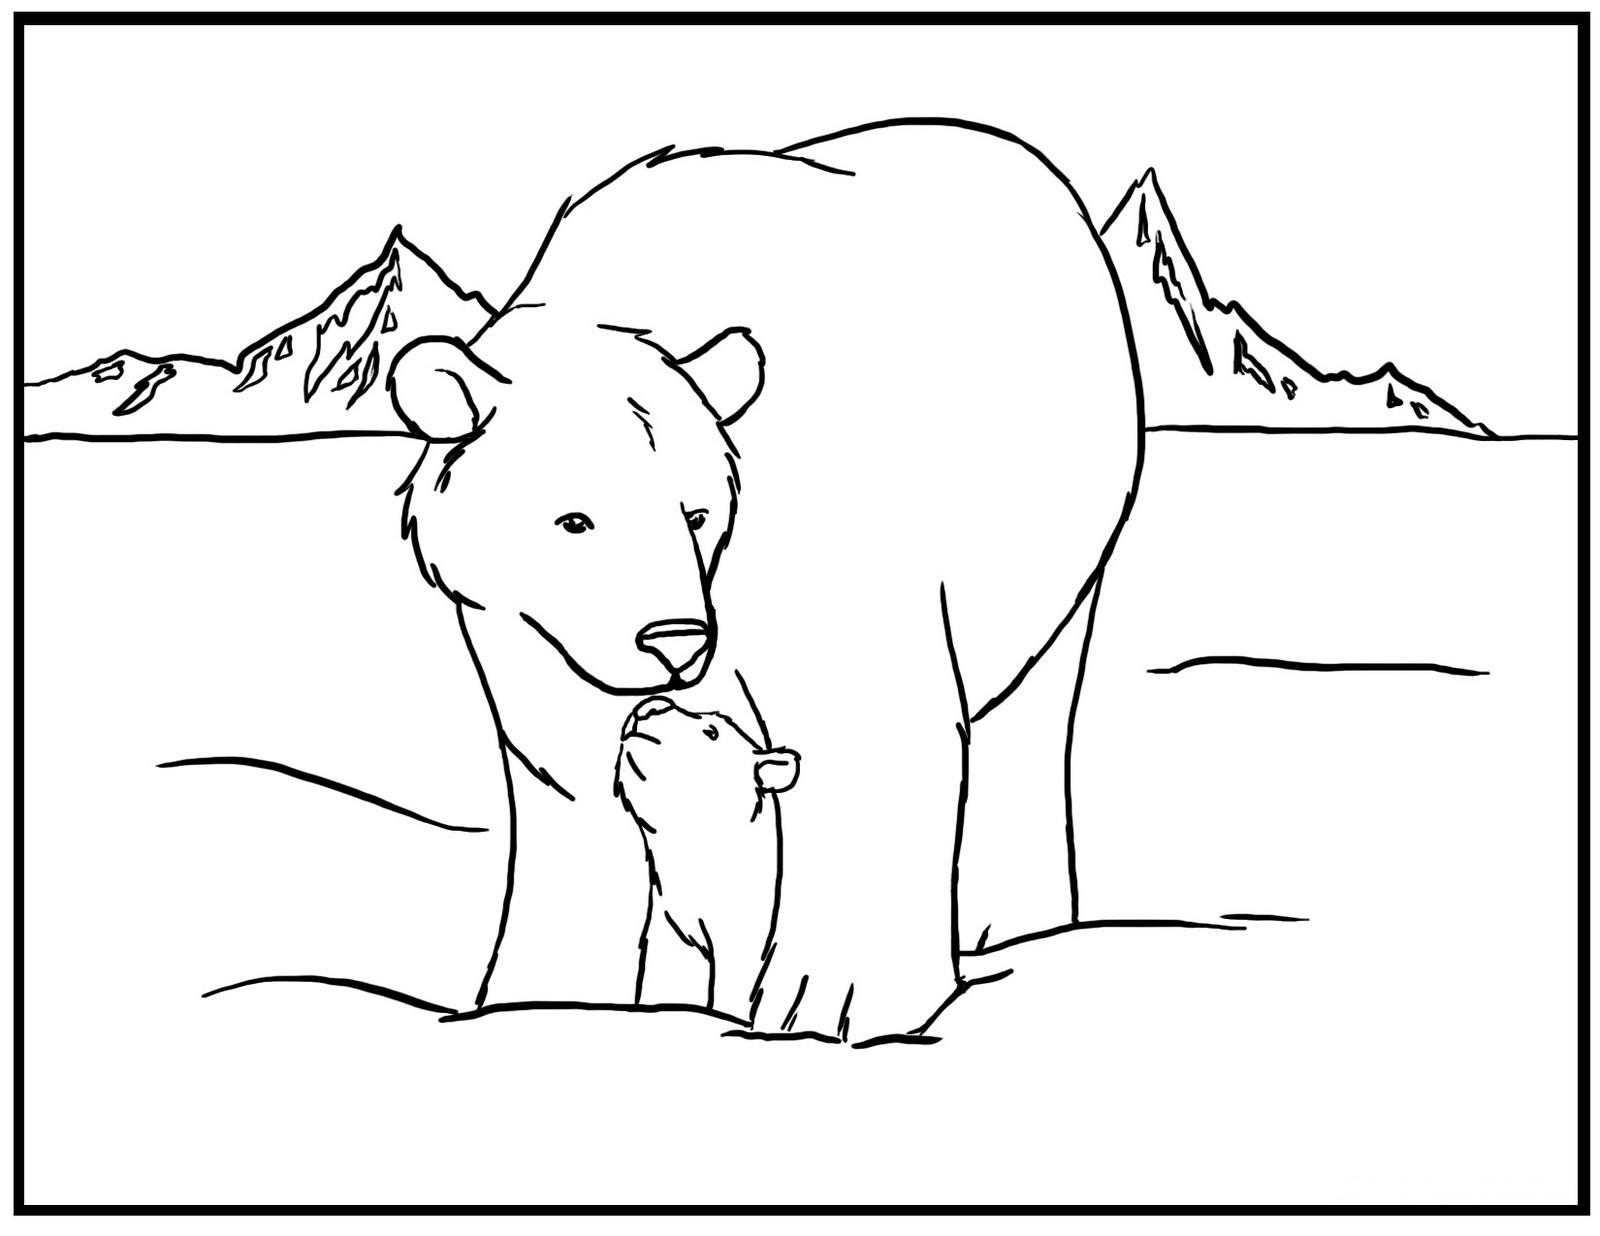 Polar Bear And Cub Coloring Page